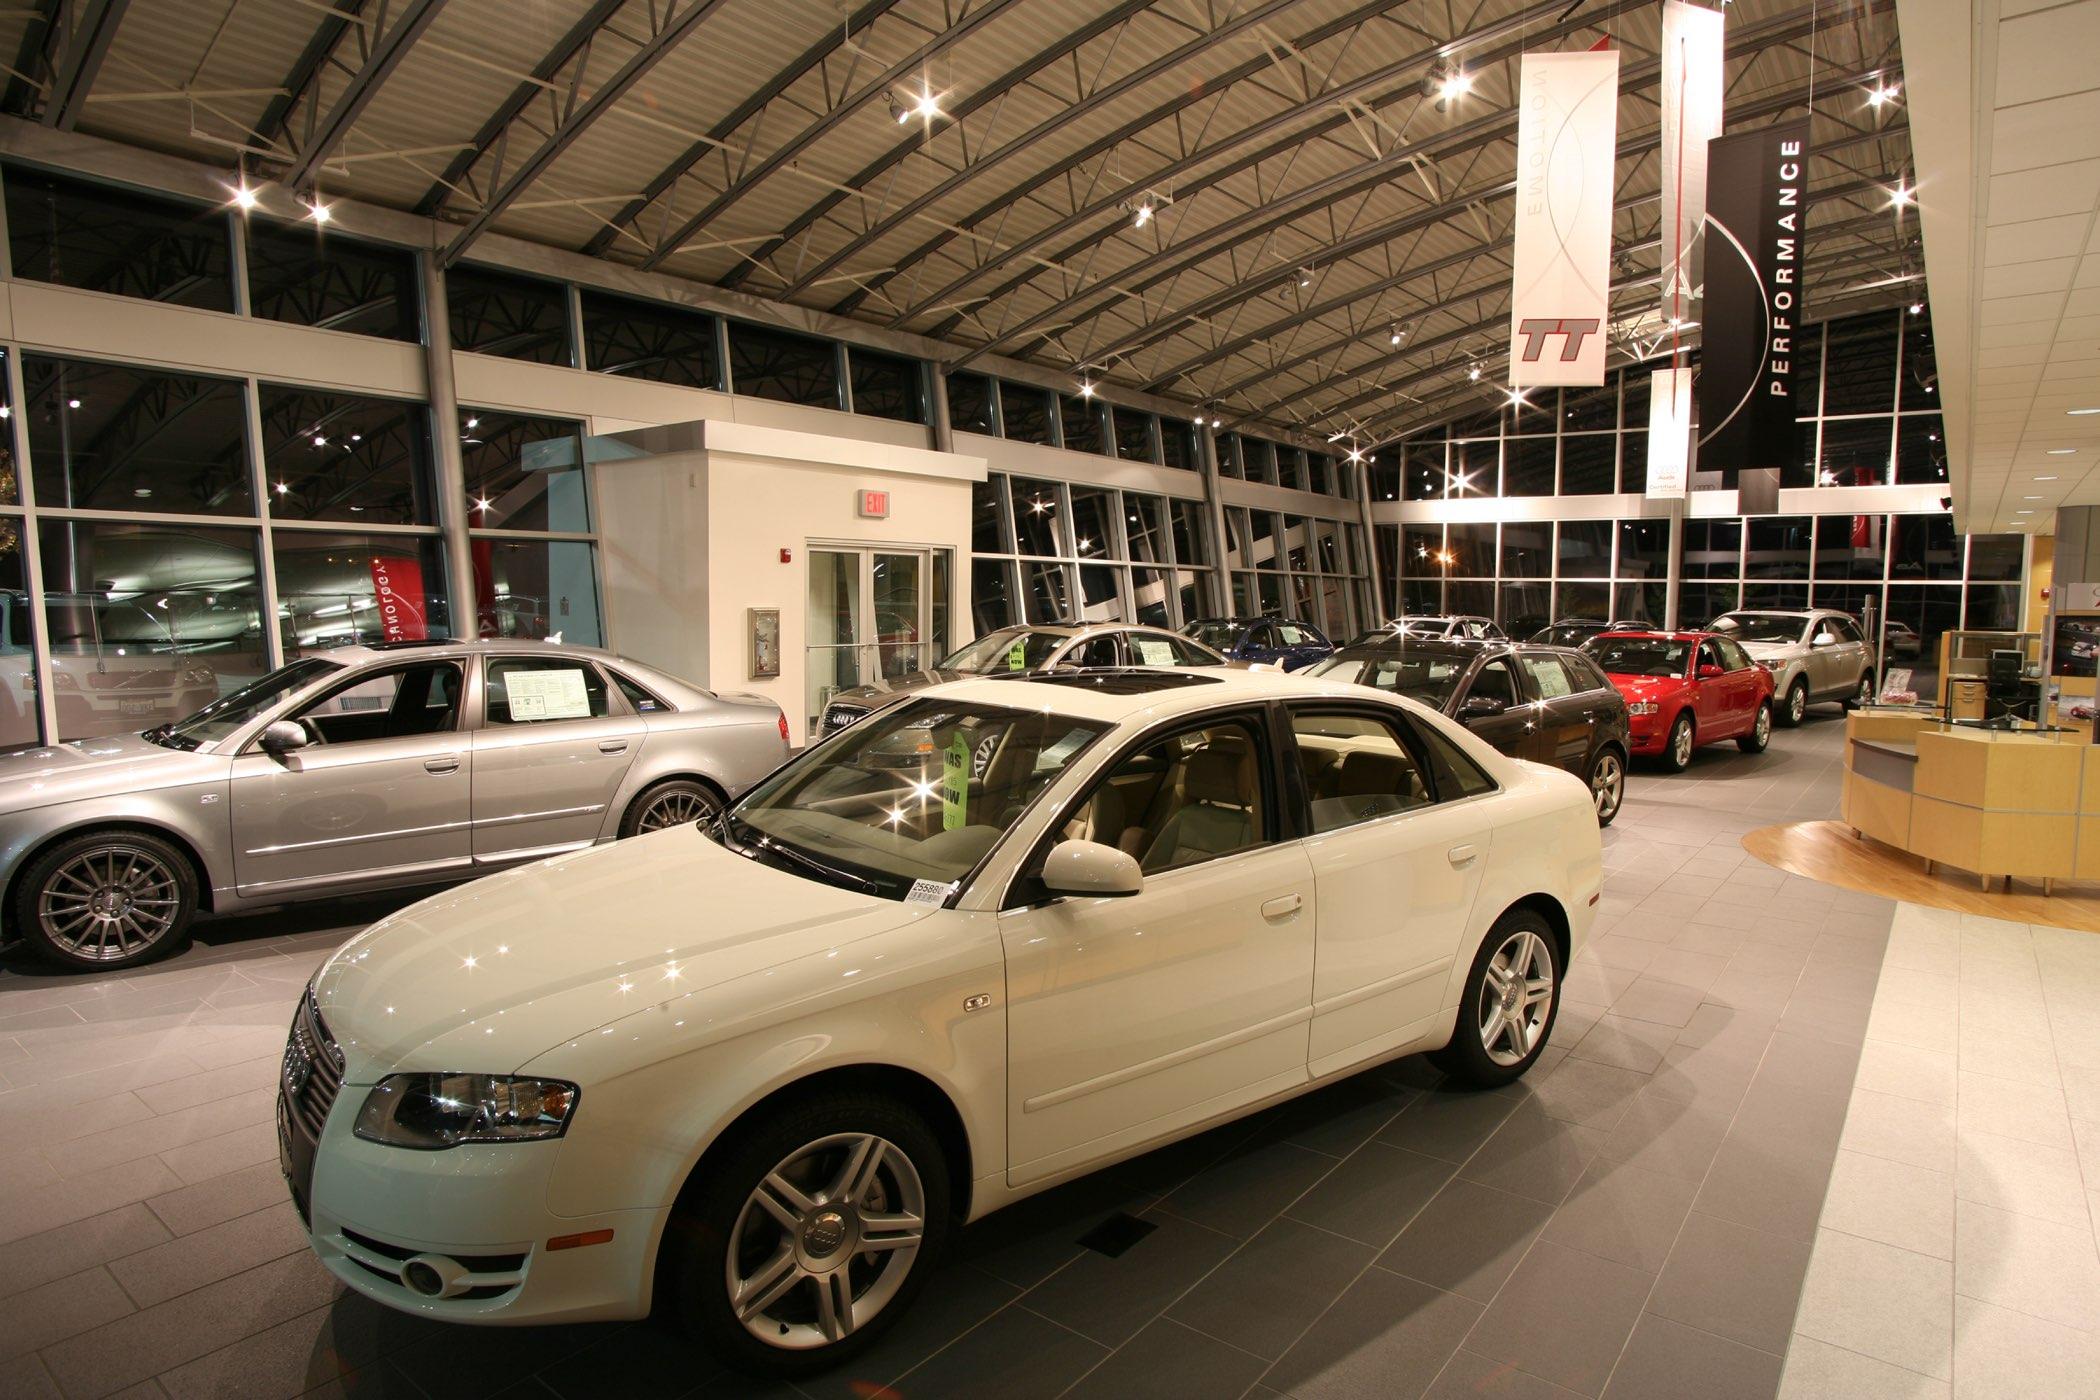 Barrier Audi Studio Lux - Barrier audi